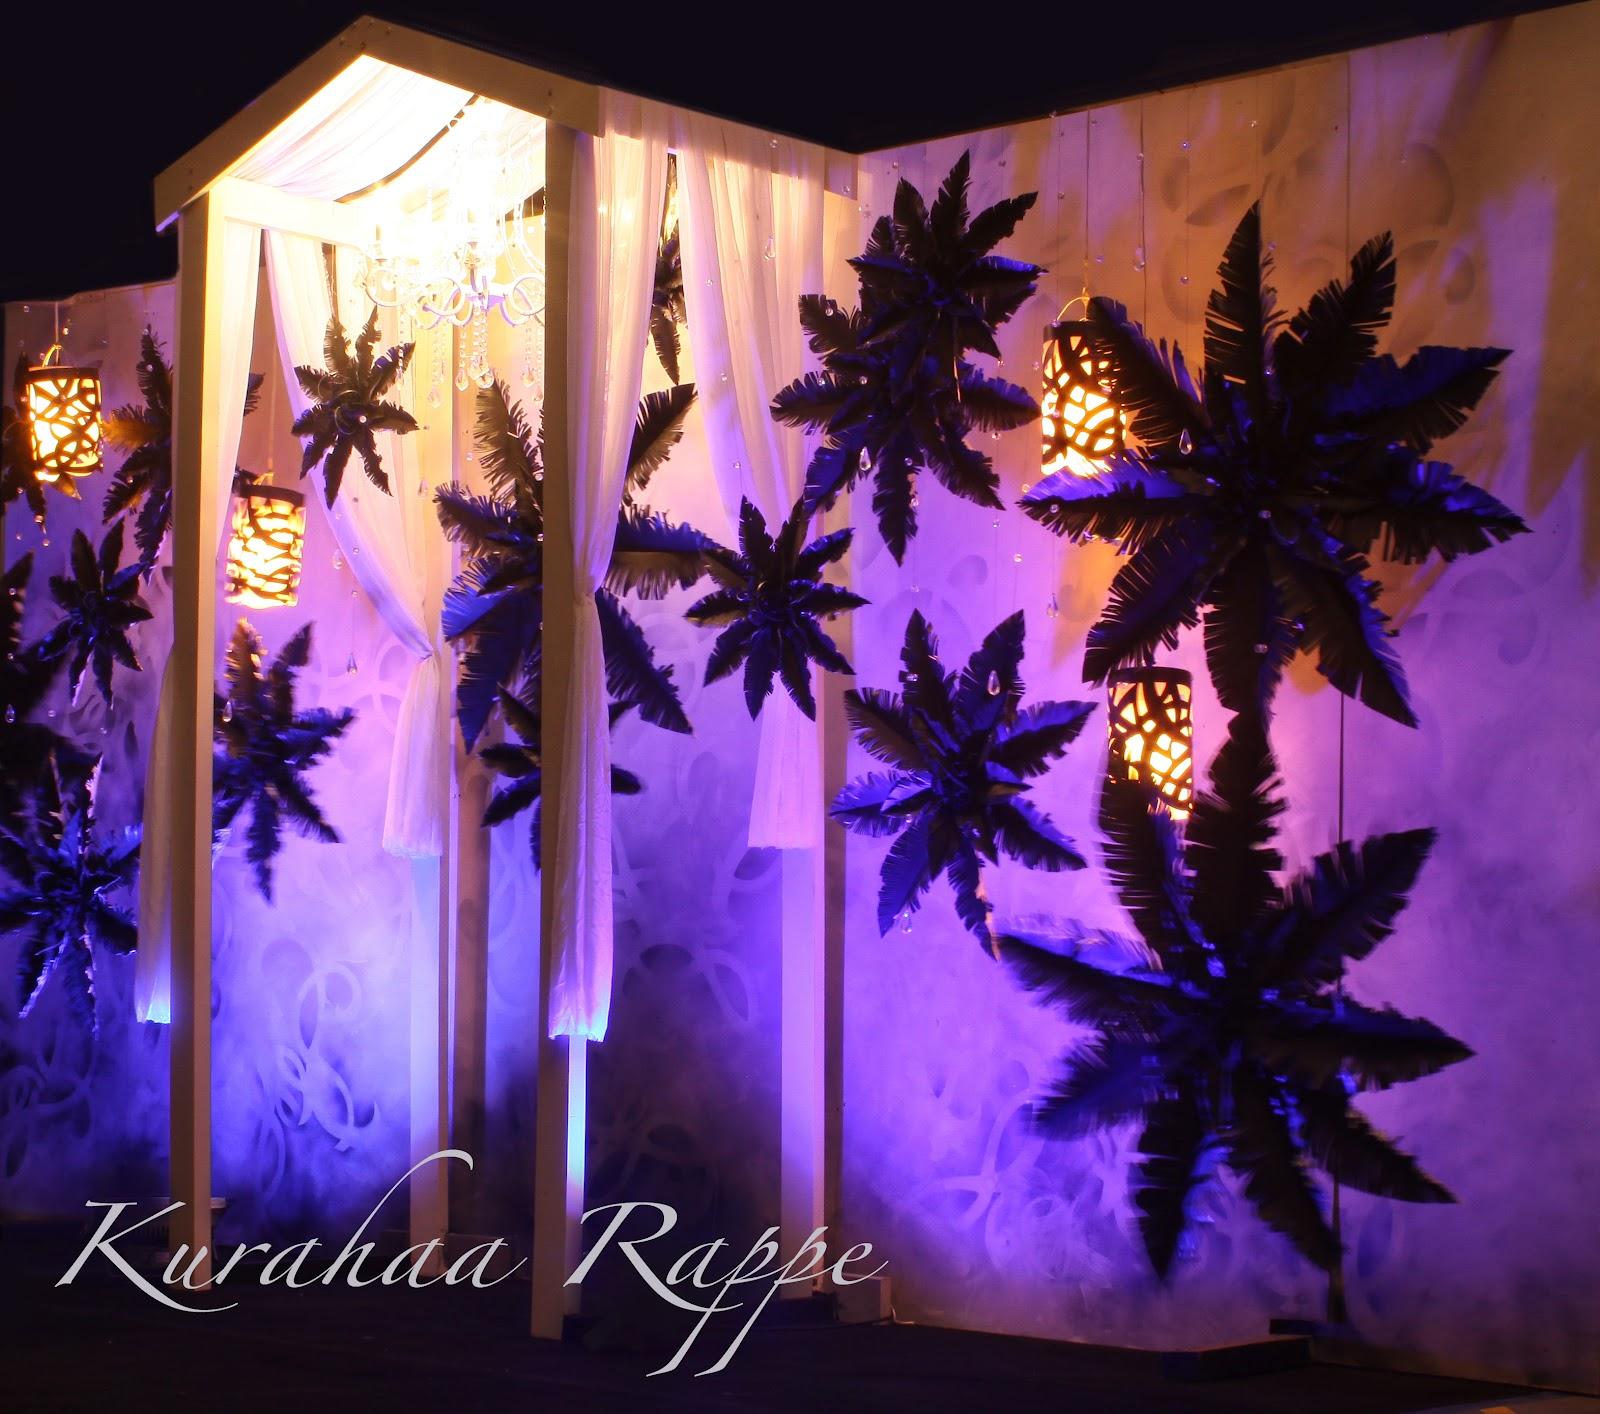 Kurahaa rappe black swan weddibg backdrop n decoration junglespirit Choice Image